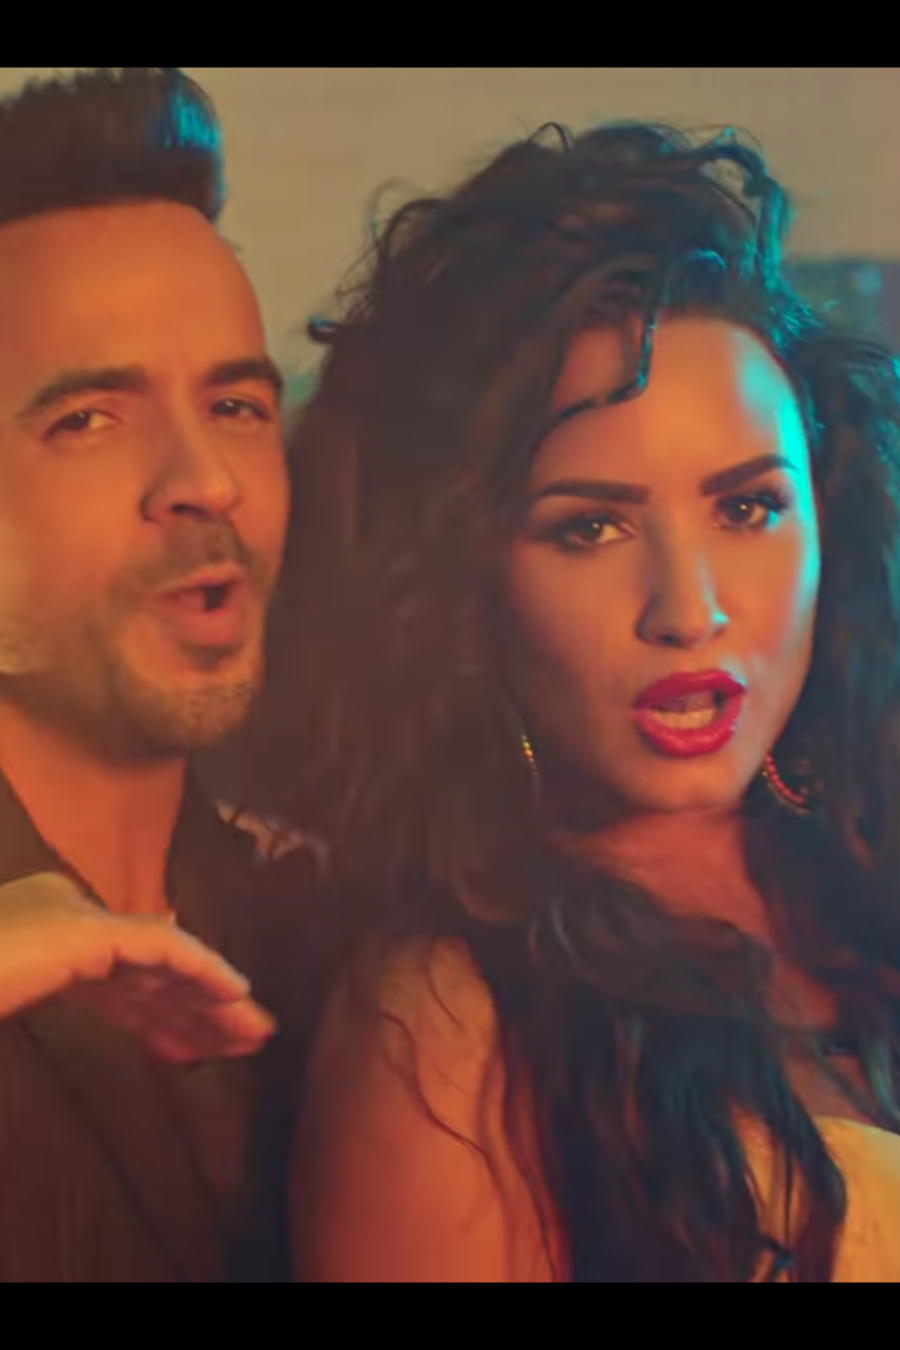 Luis Fonsi  y Demi Lovato en Echame la Culpa